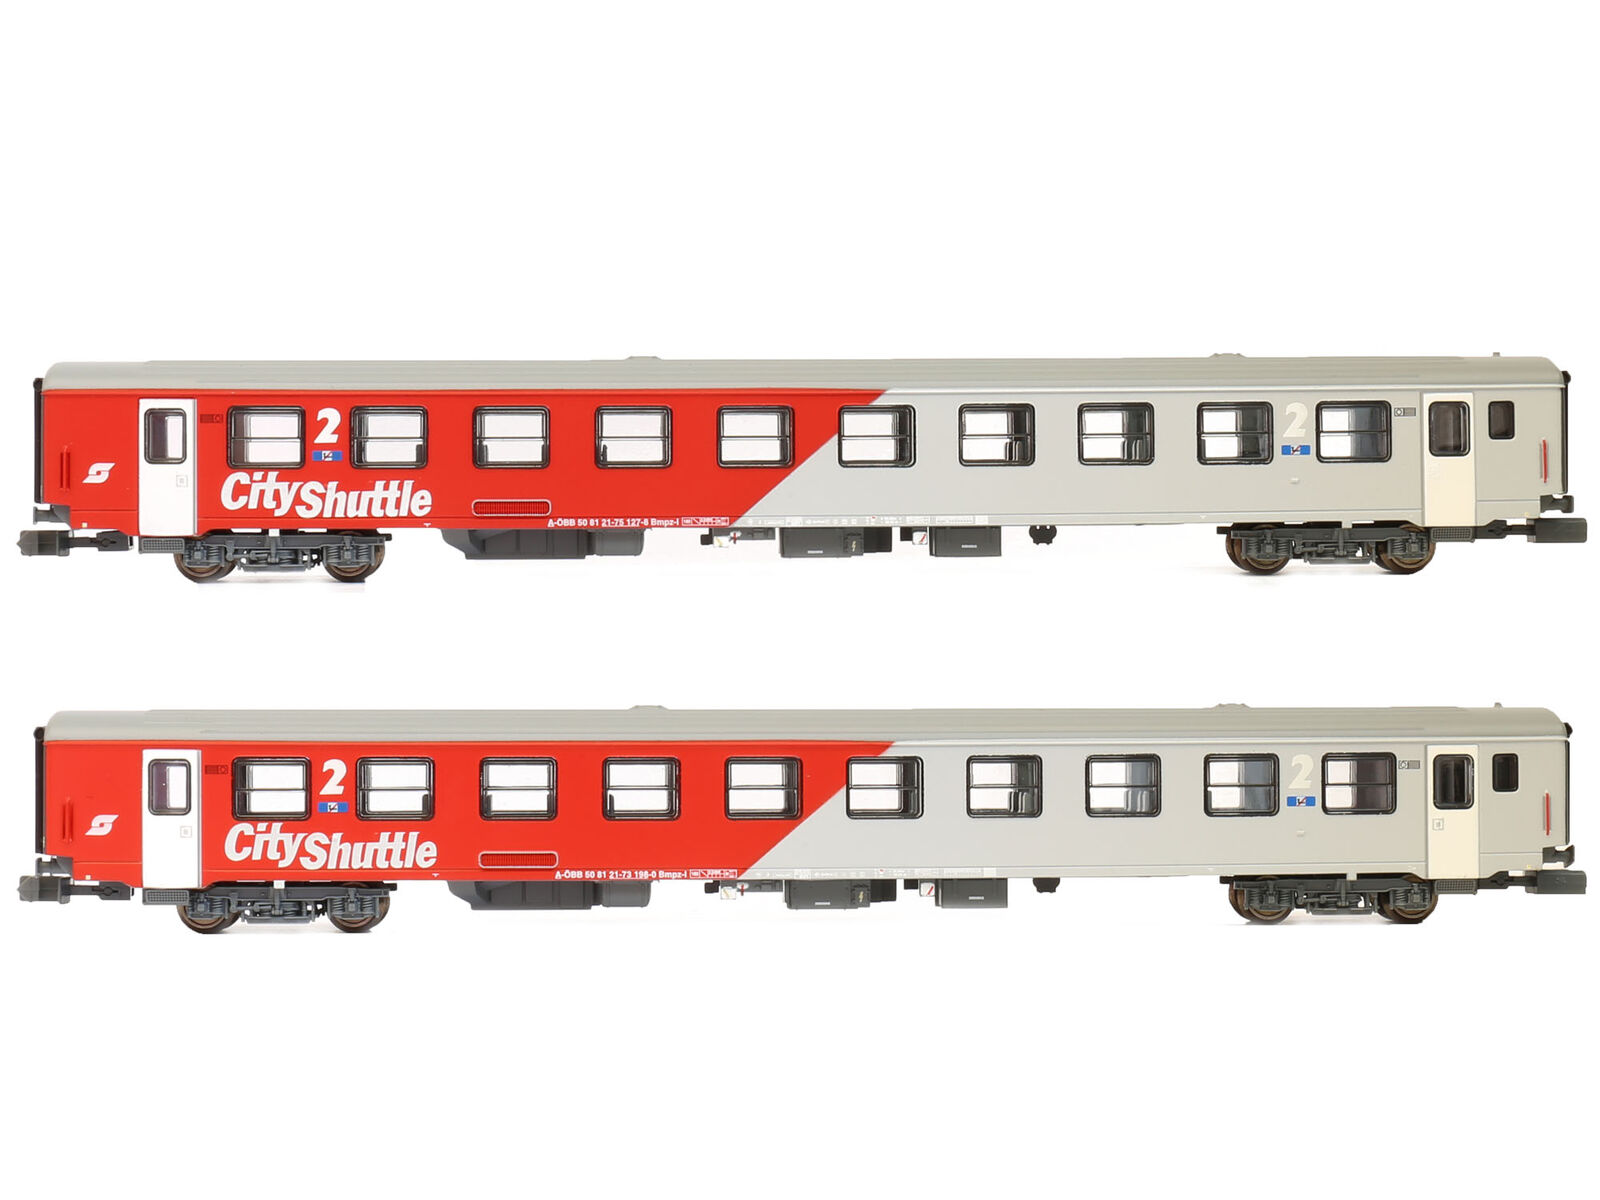 Jägerndorfer JC60230 - Personenwagen Set City Shuttle Pflatsch ÖBB Ep.V 2x - NEU